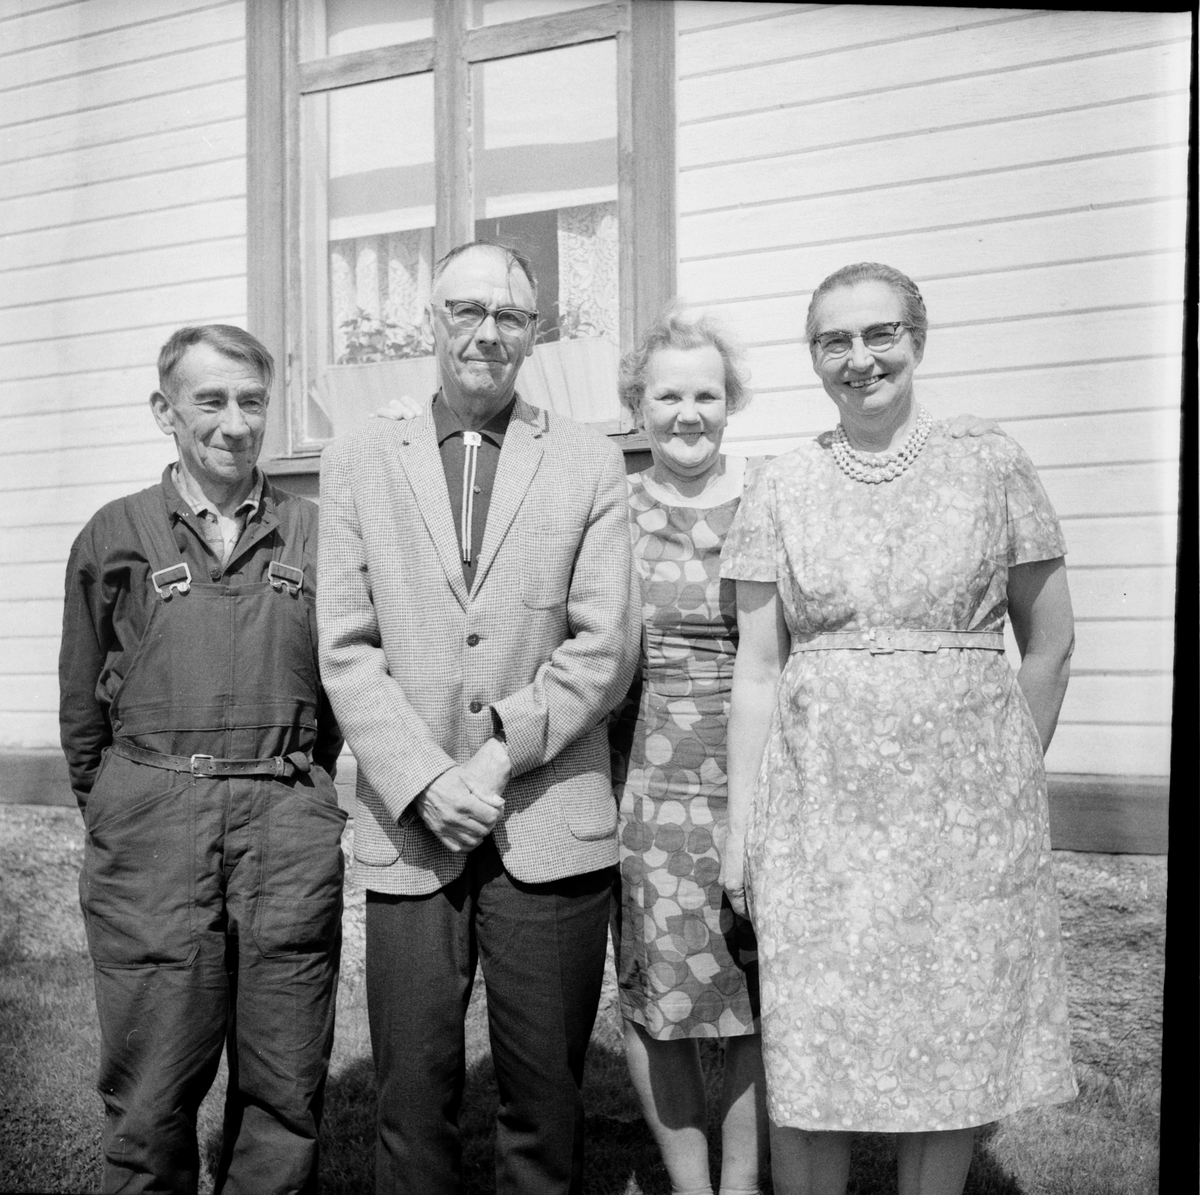 Kållänges i Kilen amerikabesök. 9/6-1967